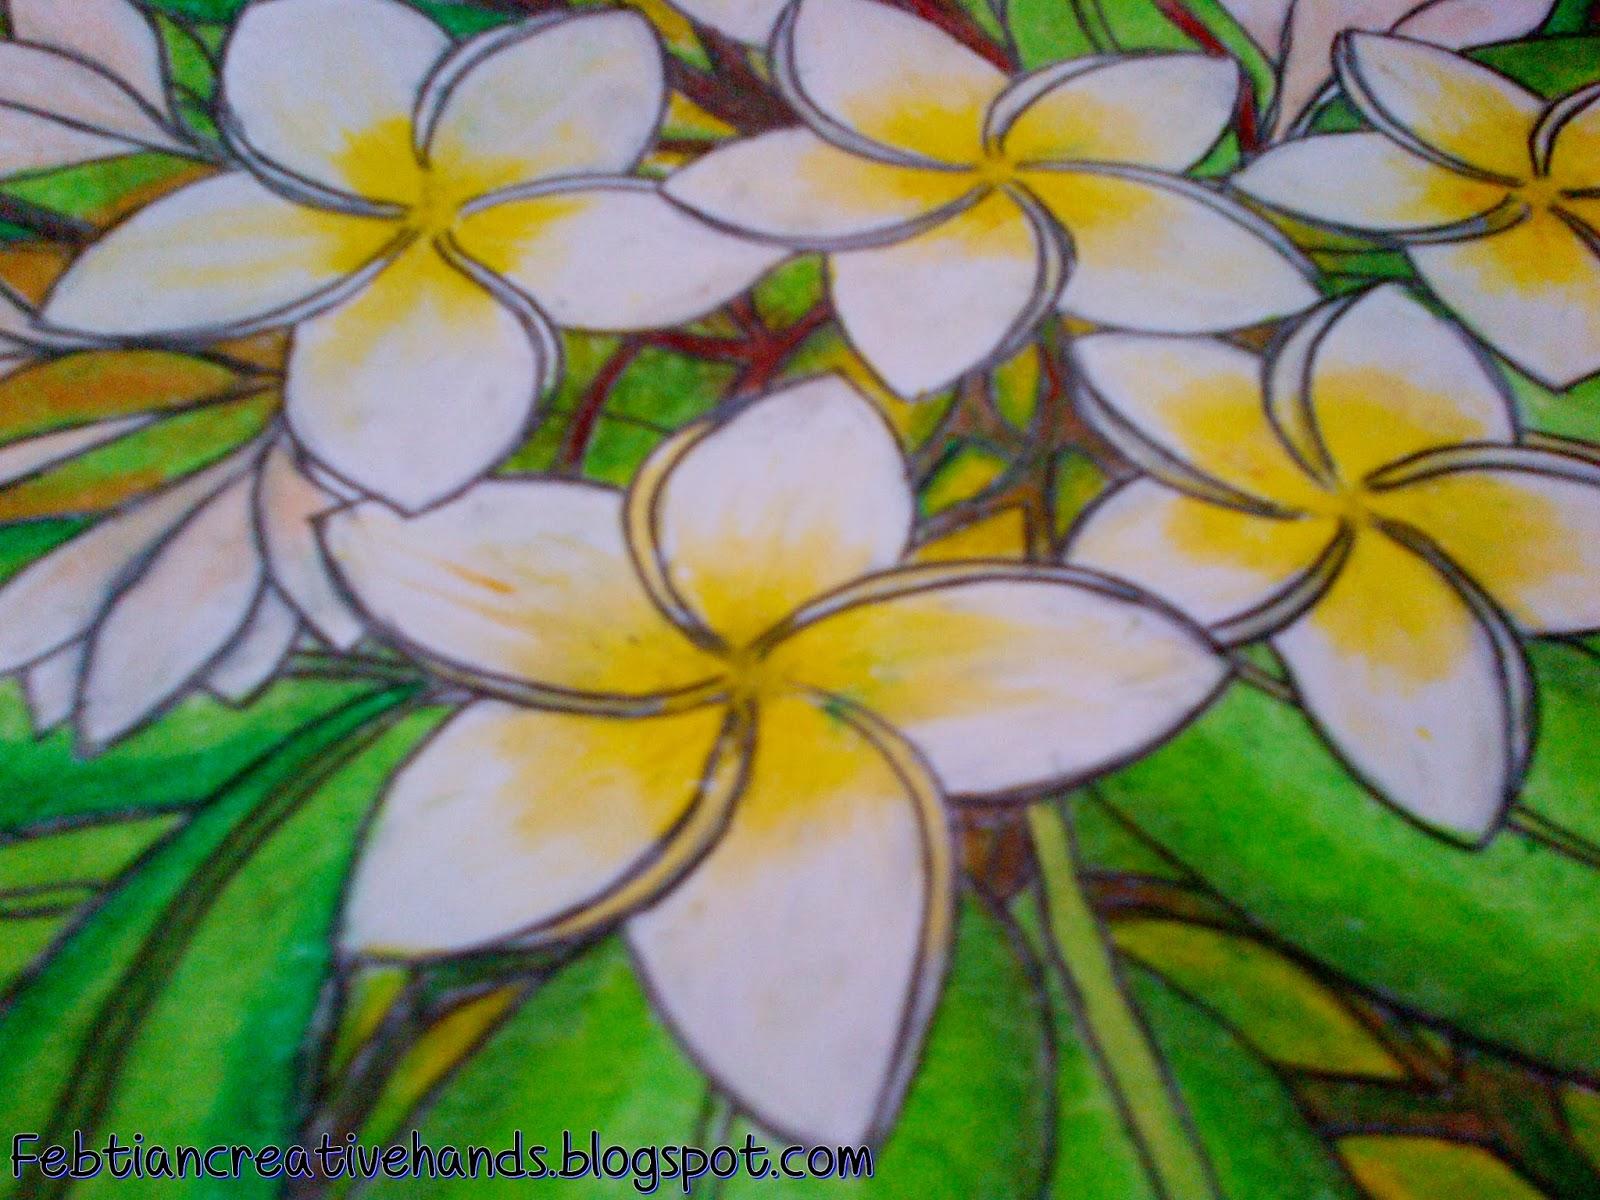 Gambar Ilustrasi Bunga Kamboja Hilustrasi